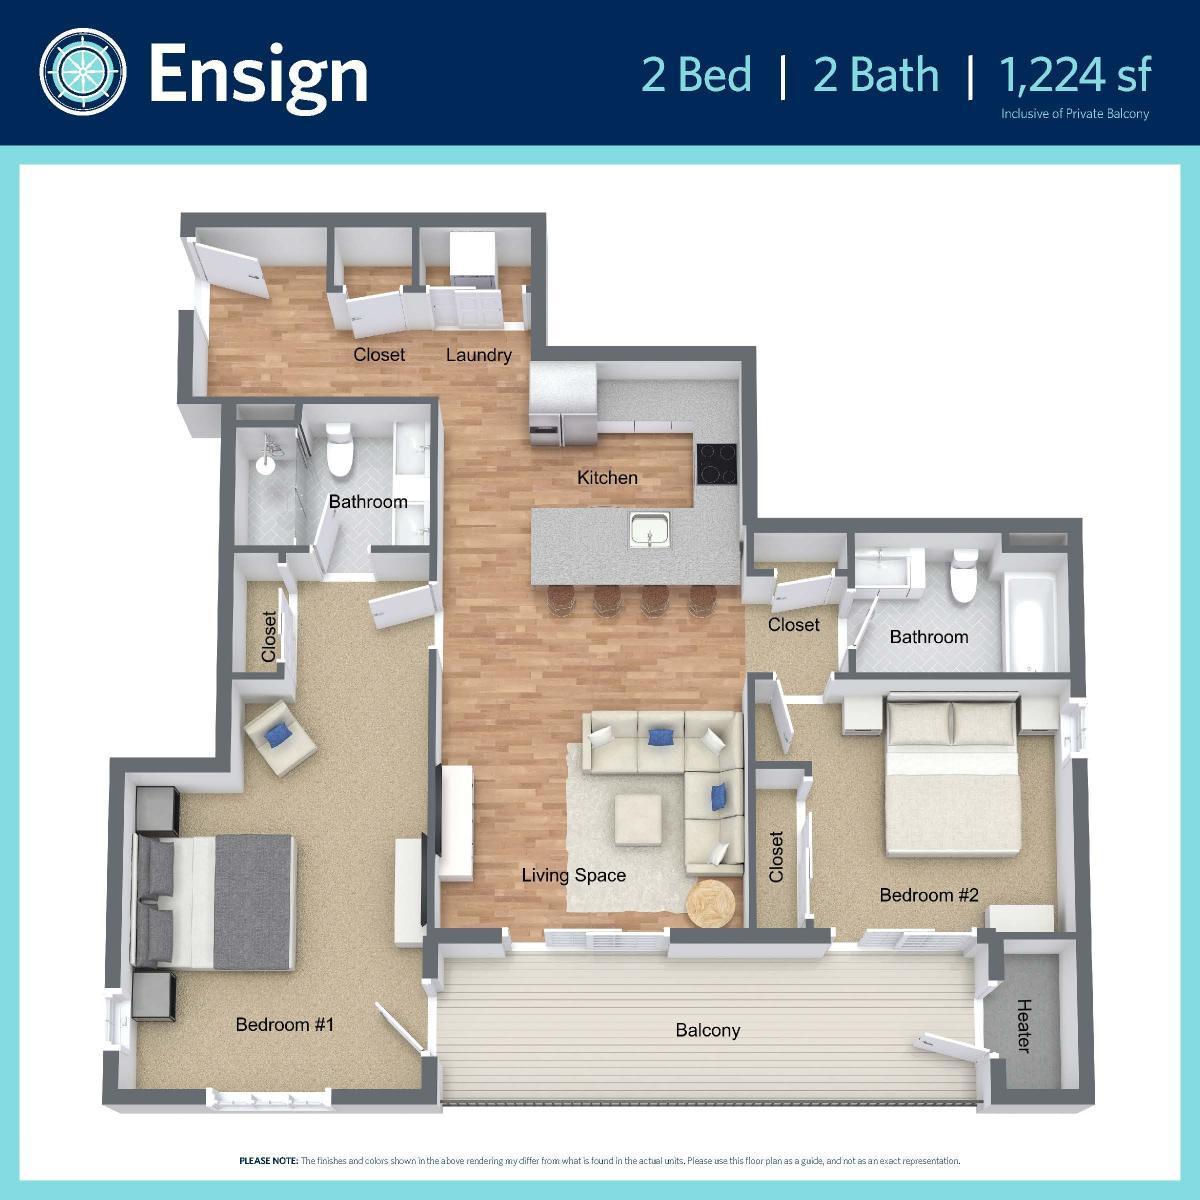 Ensign - 2 bed, 2 bath - 1,224 sq ft